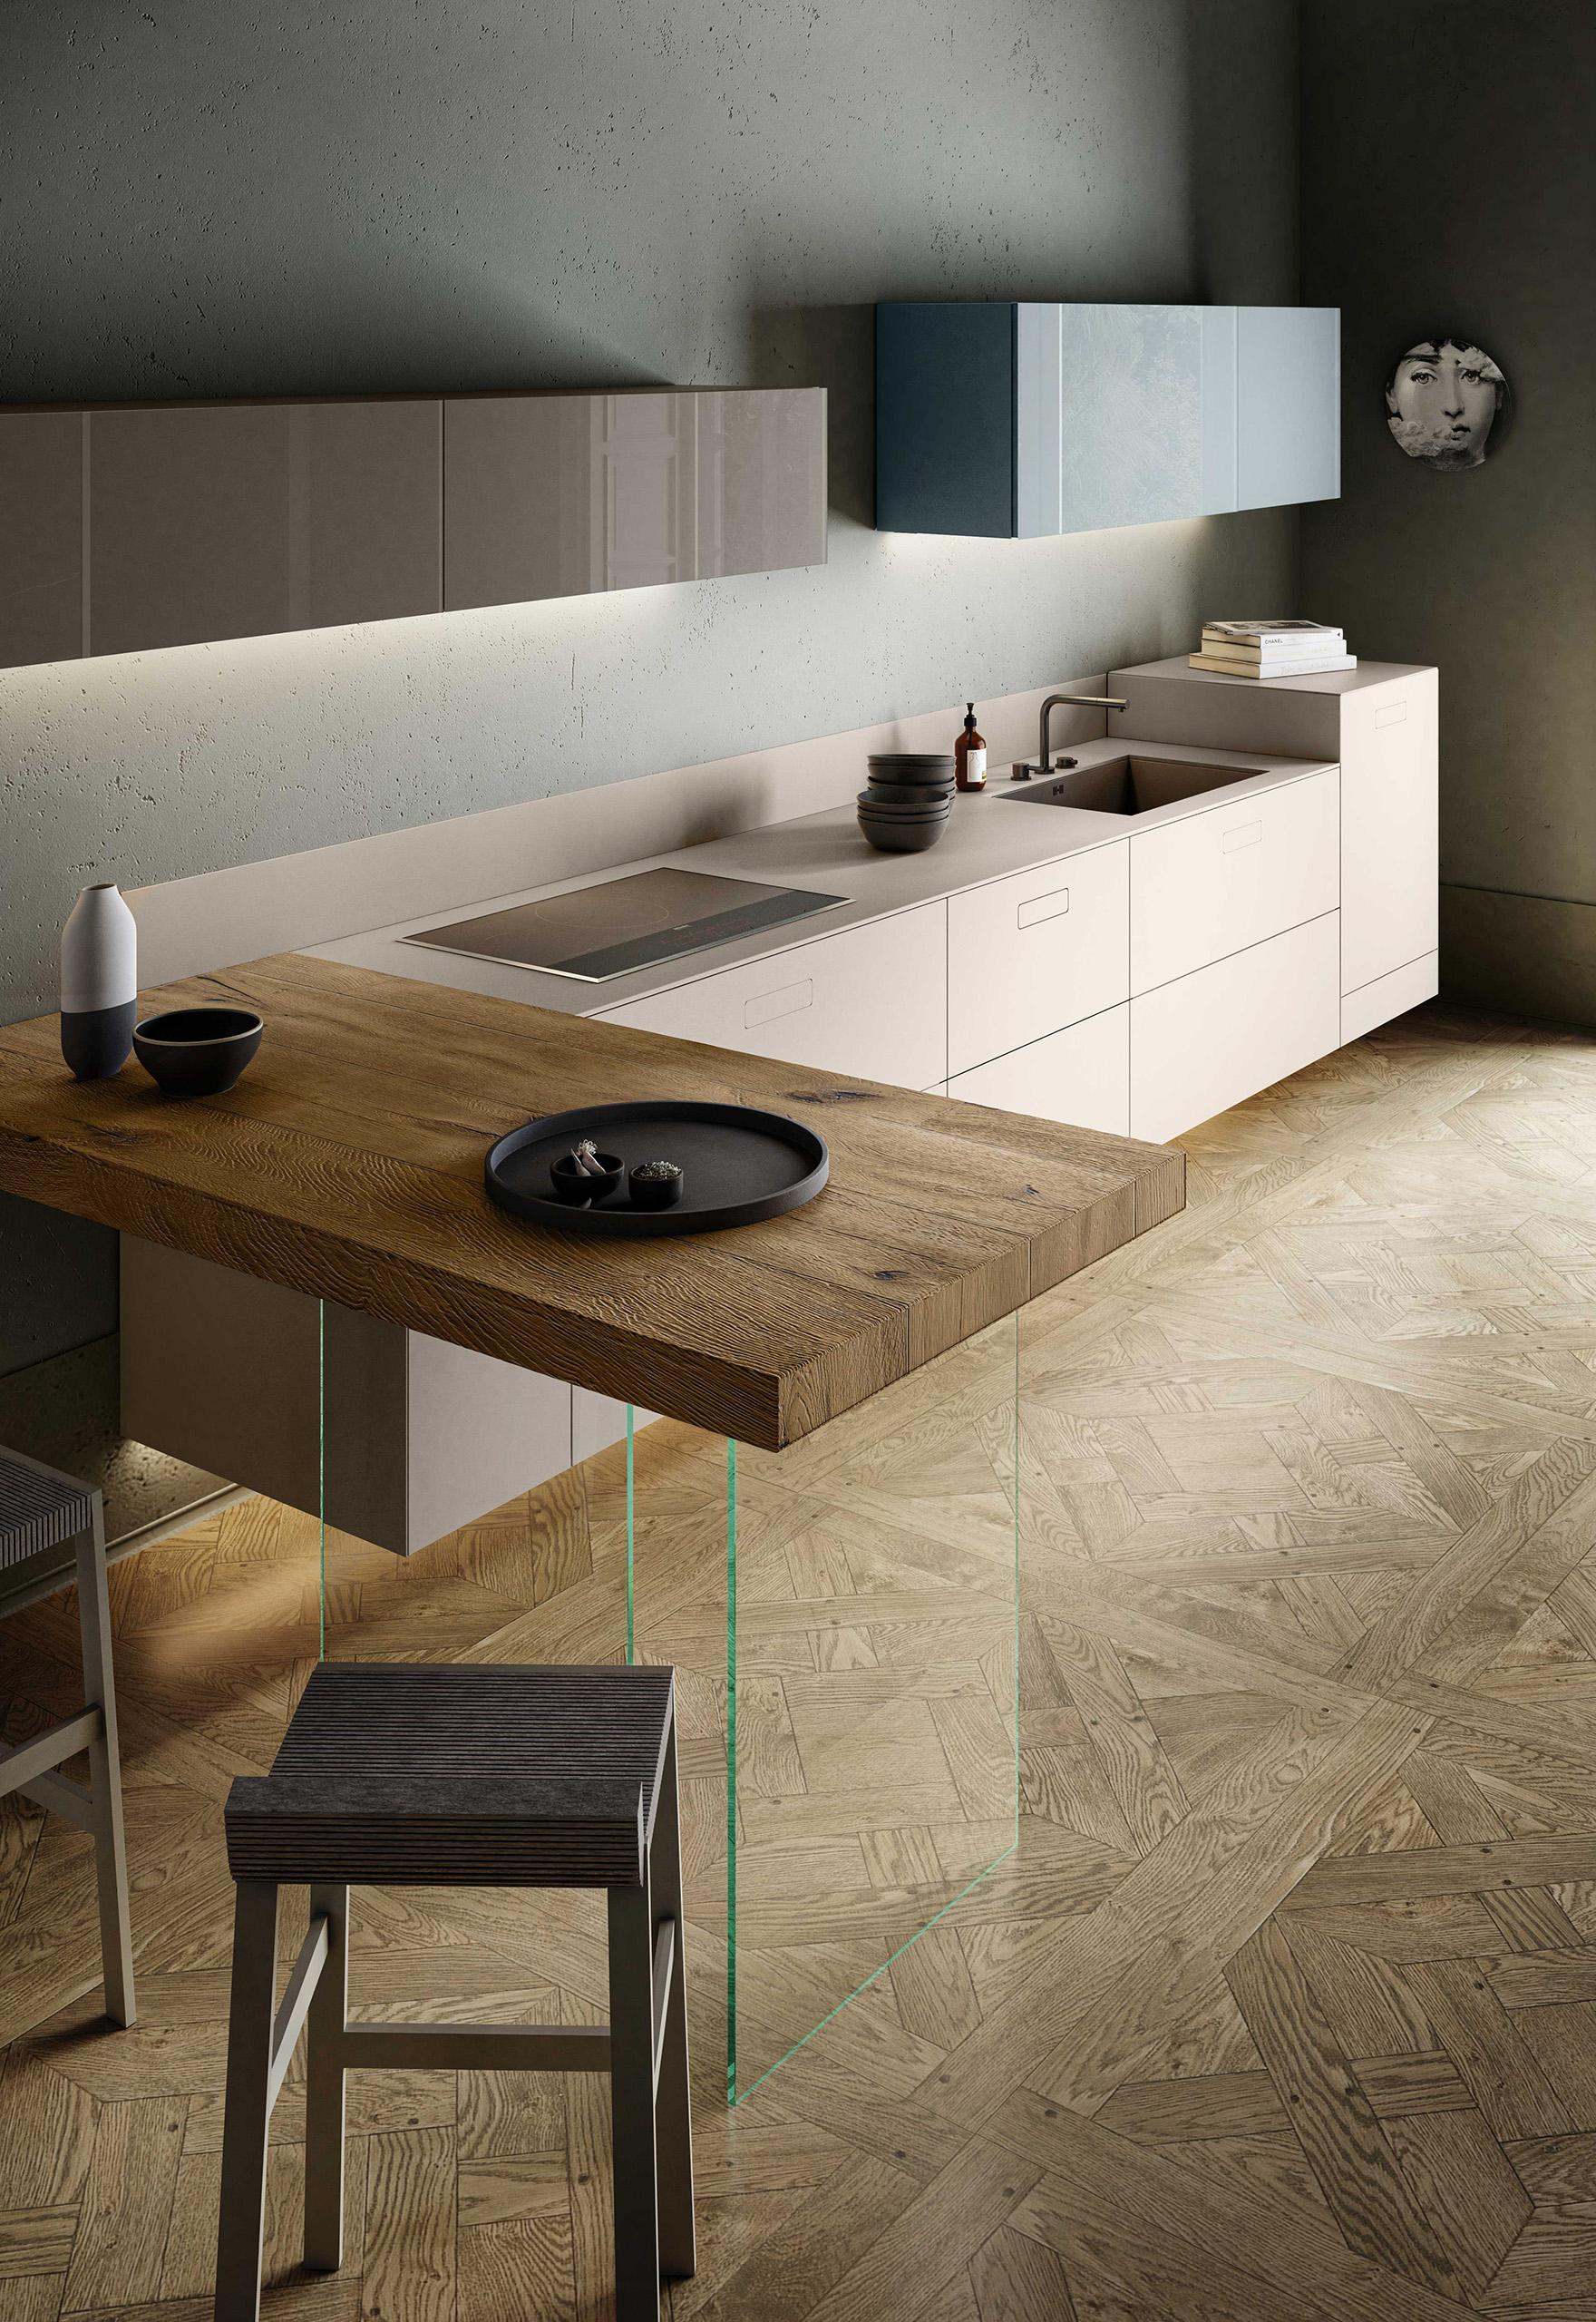 Kitchen-Villa-Italiana-Dettaglio-1